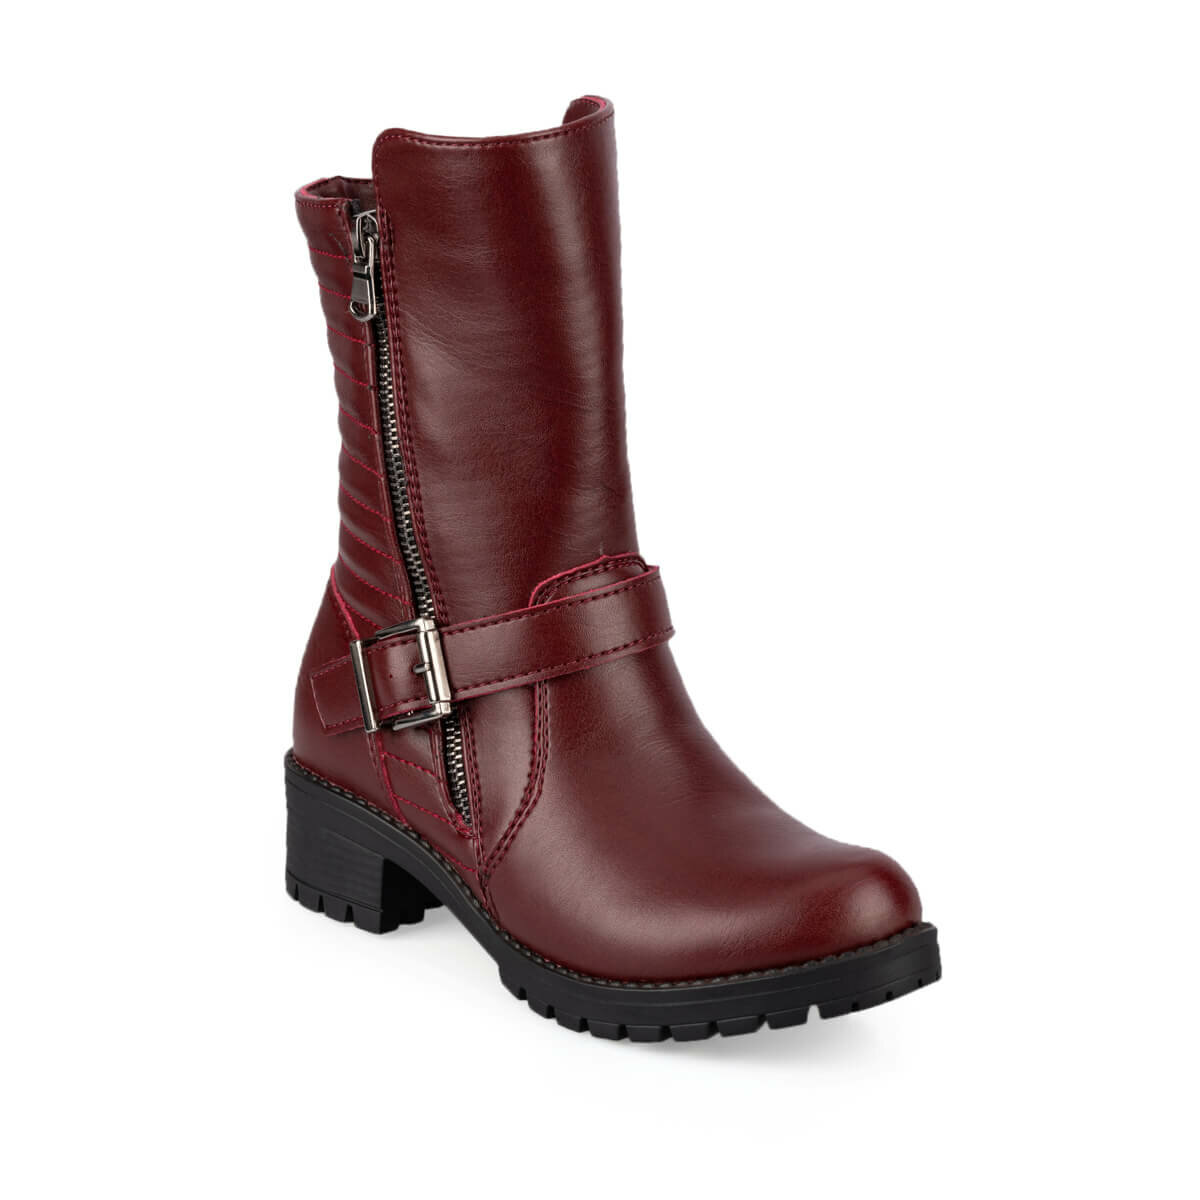 FLO GRILL 9PR Burgundy Female Child Basic Casual Shoes KINETIX